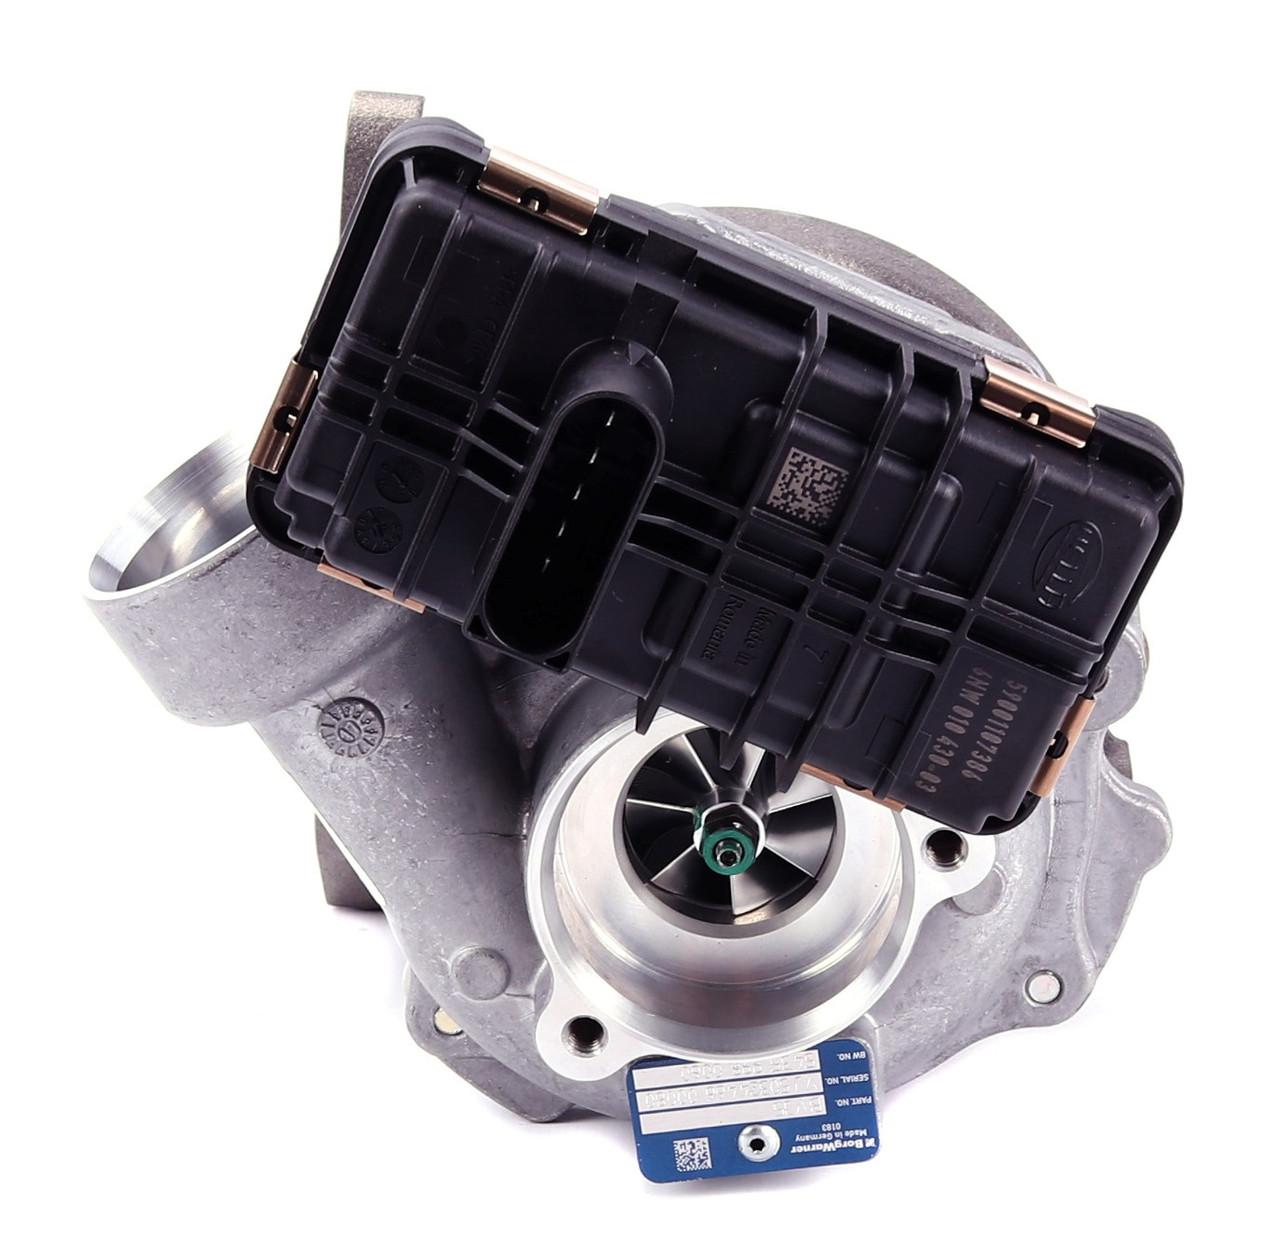 Турбіна BorgWarner  BMW 5 (F10/F11)/X5 (F15/F85)/X1 (E84)/4 (F33) 2.5d 09- (Biturbo) США